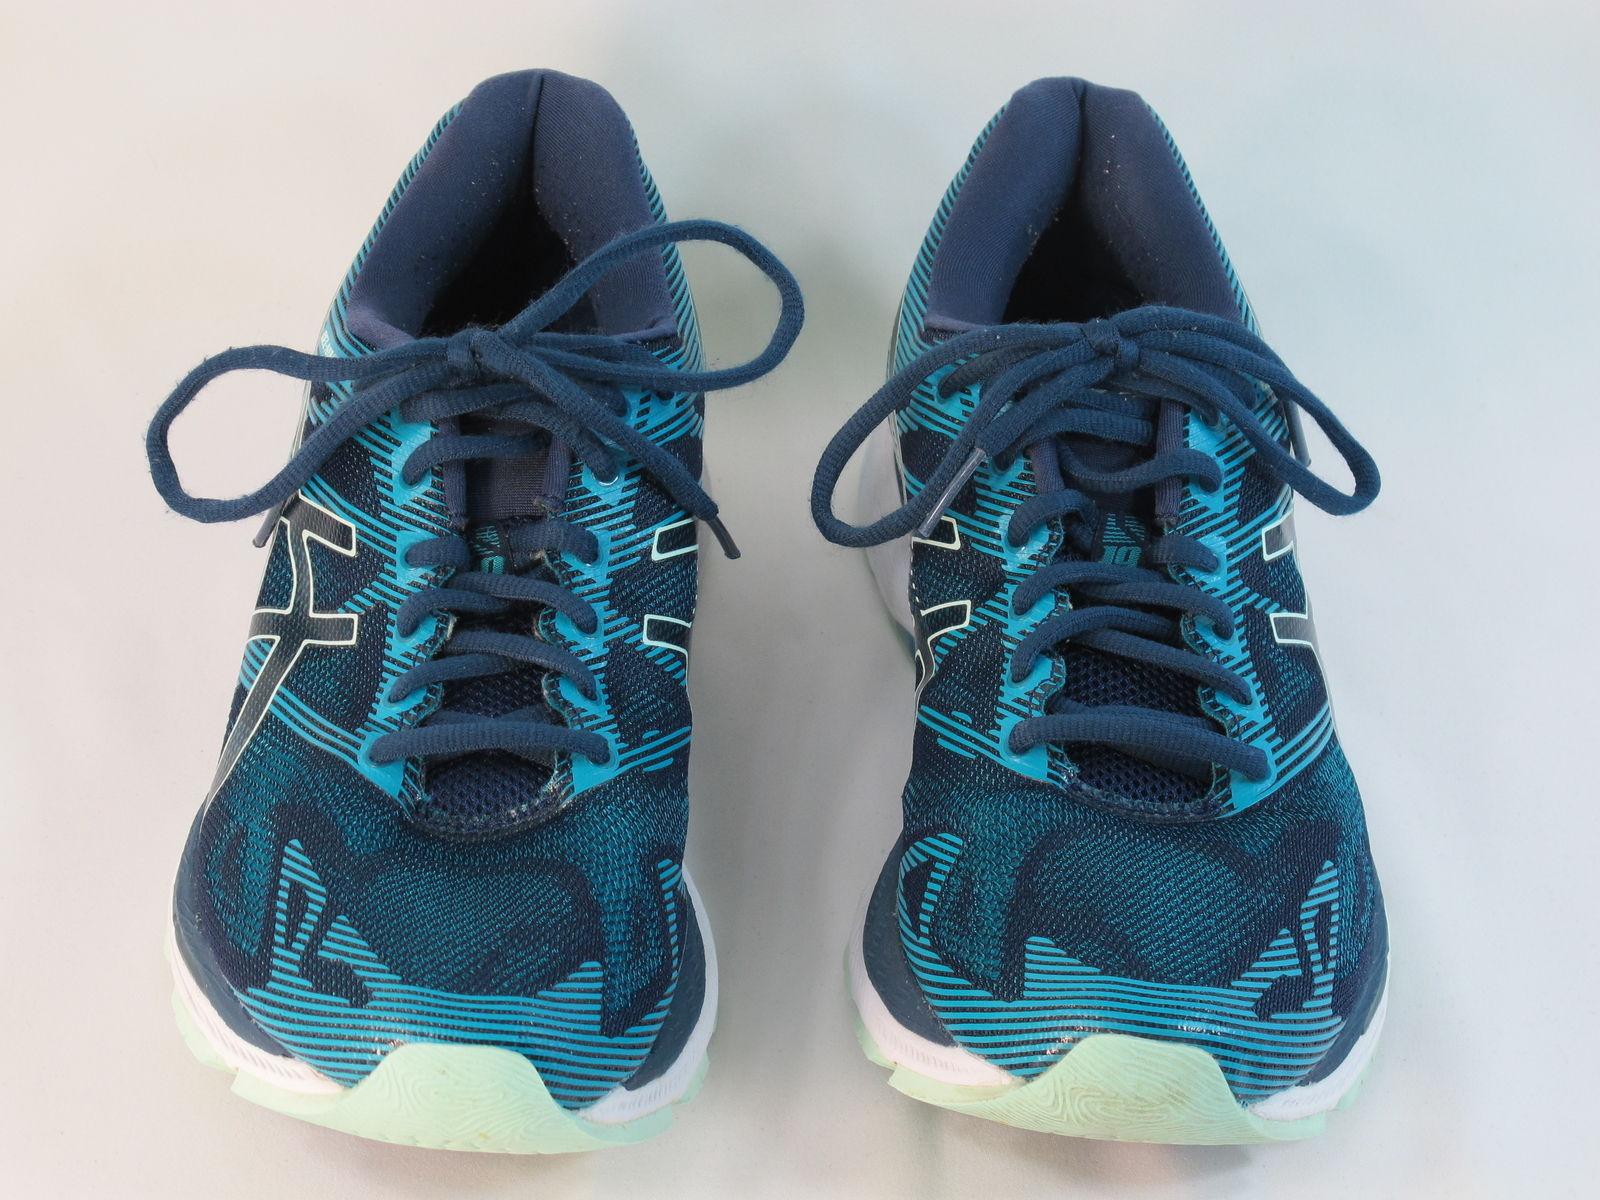 new product 4e6c3 8ff9d ASICS Gel Nimbus 19 Running Shoes Women's and 11 similar items